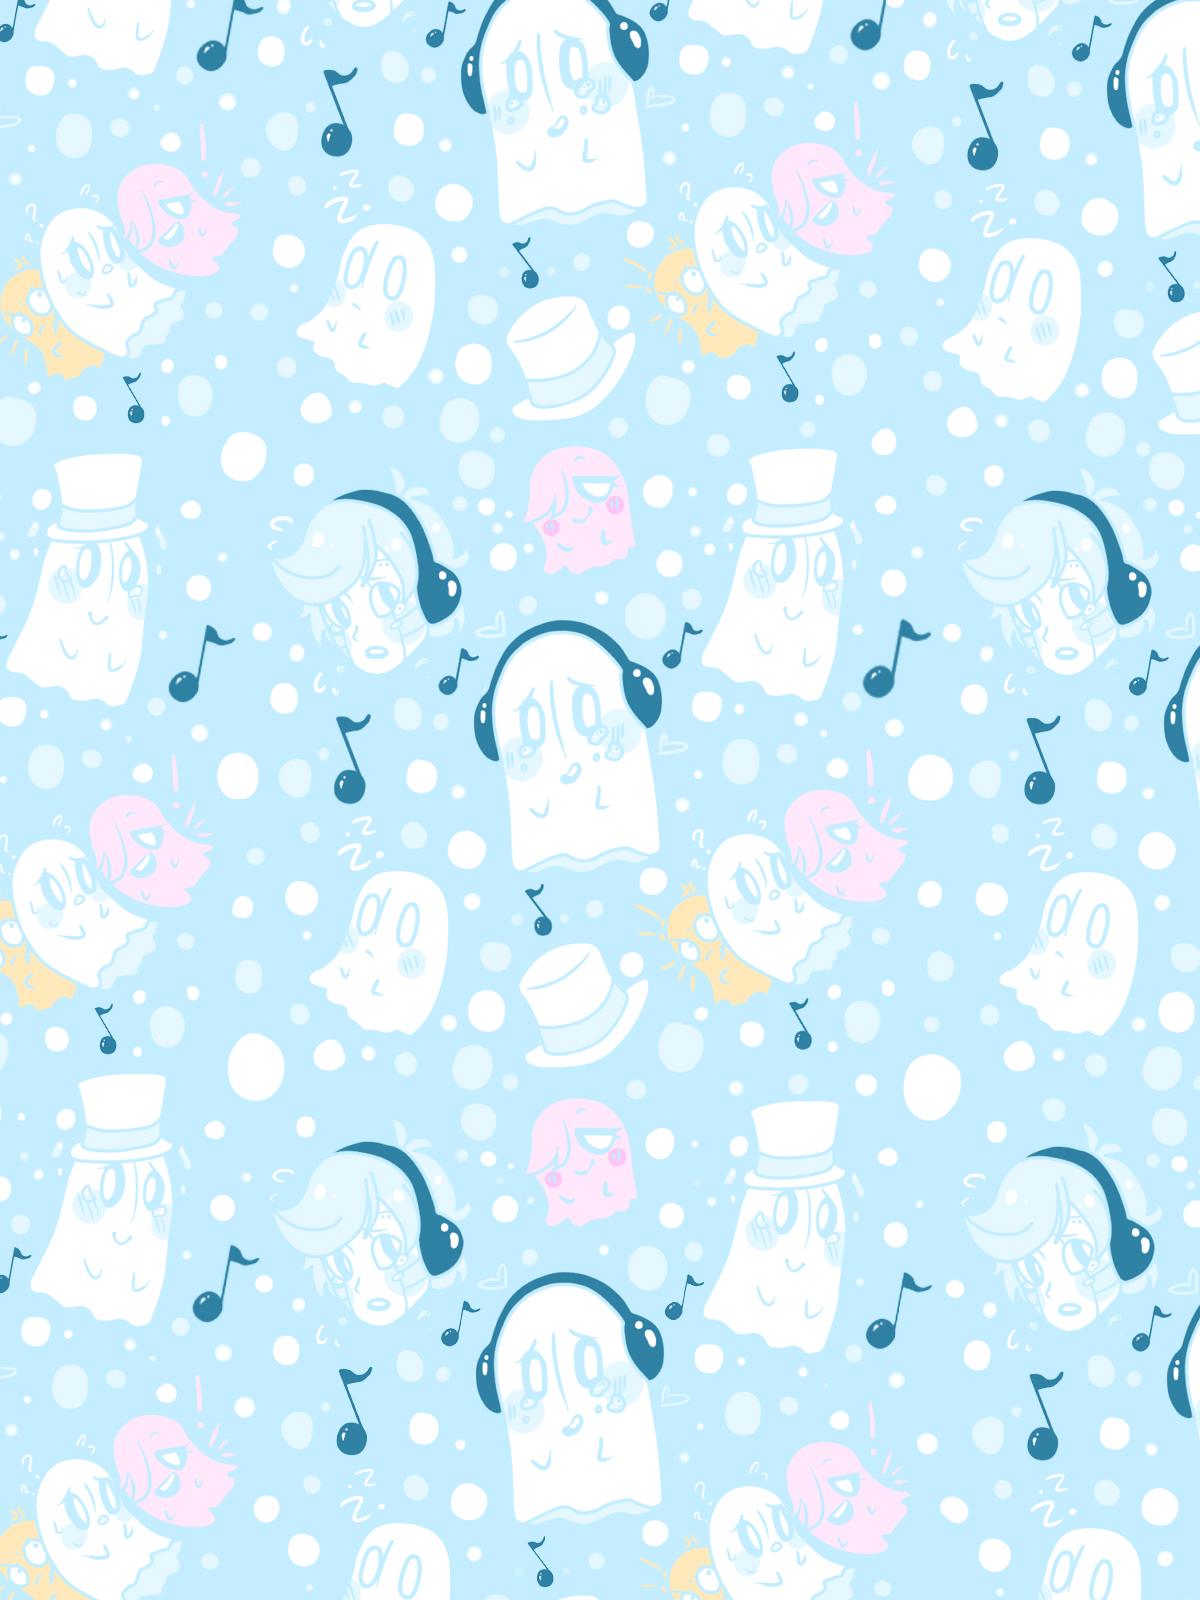 Little Napstablook Wallpaper For My Phone P Undertale Wallpaper